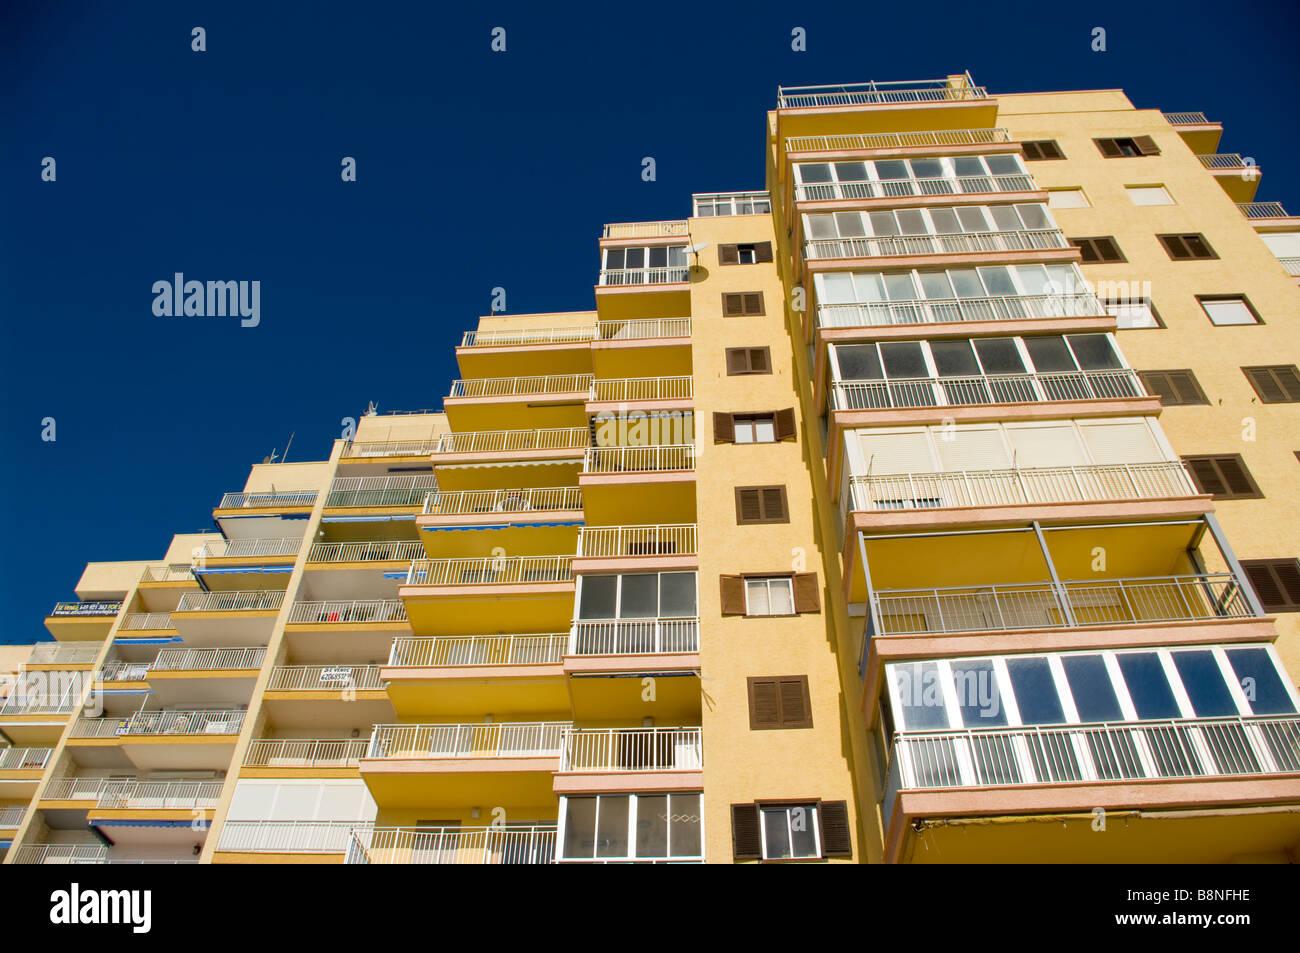 Apartment Blocks Spain Spanish Tower Block Of Flats